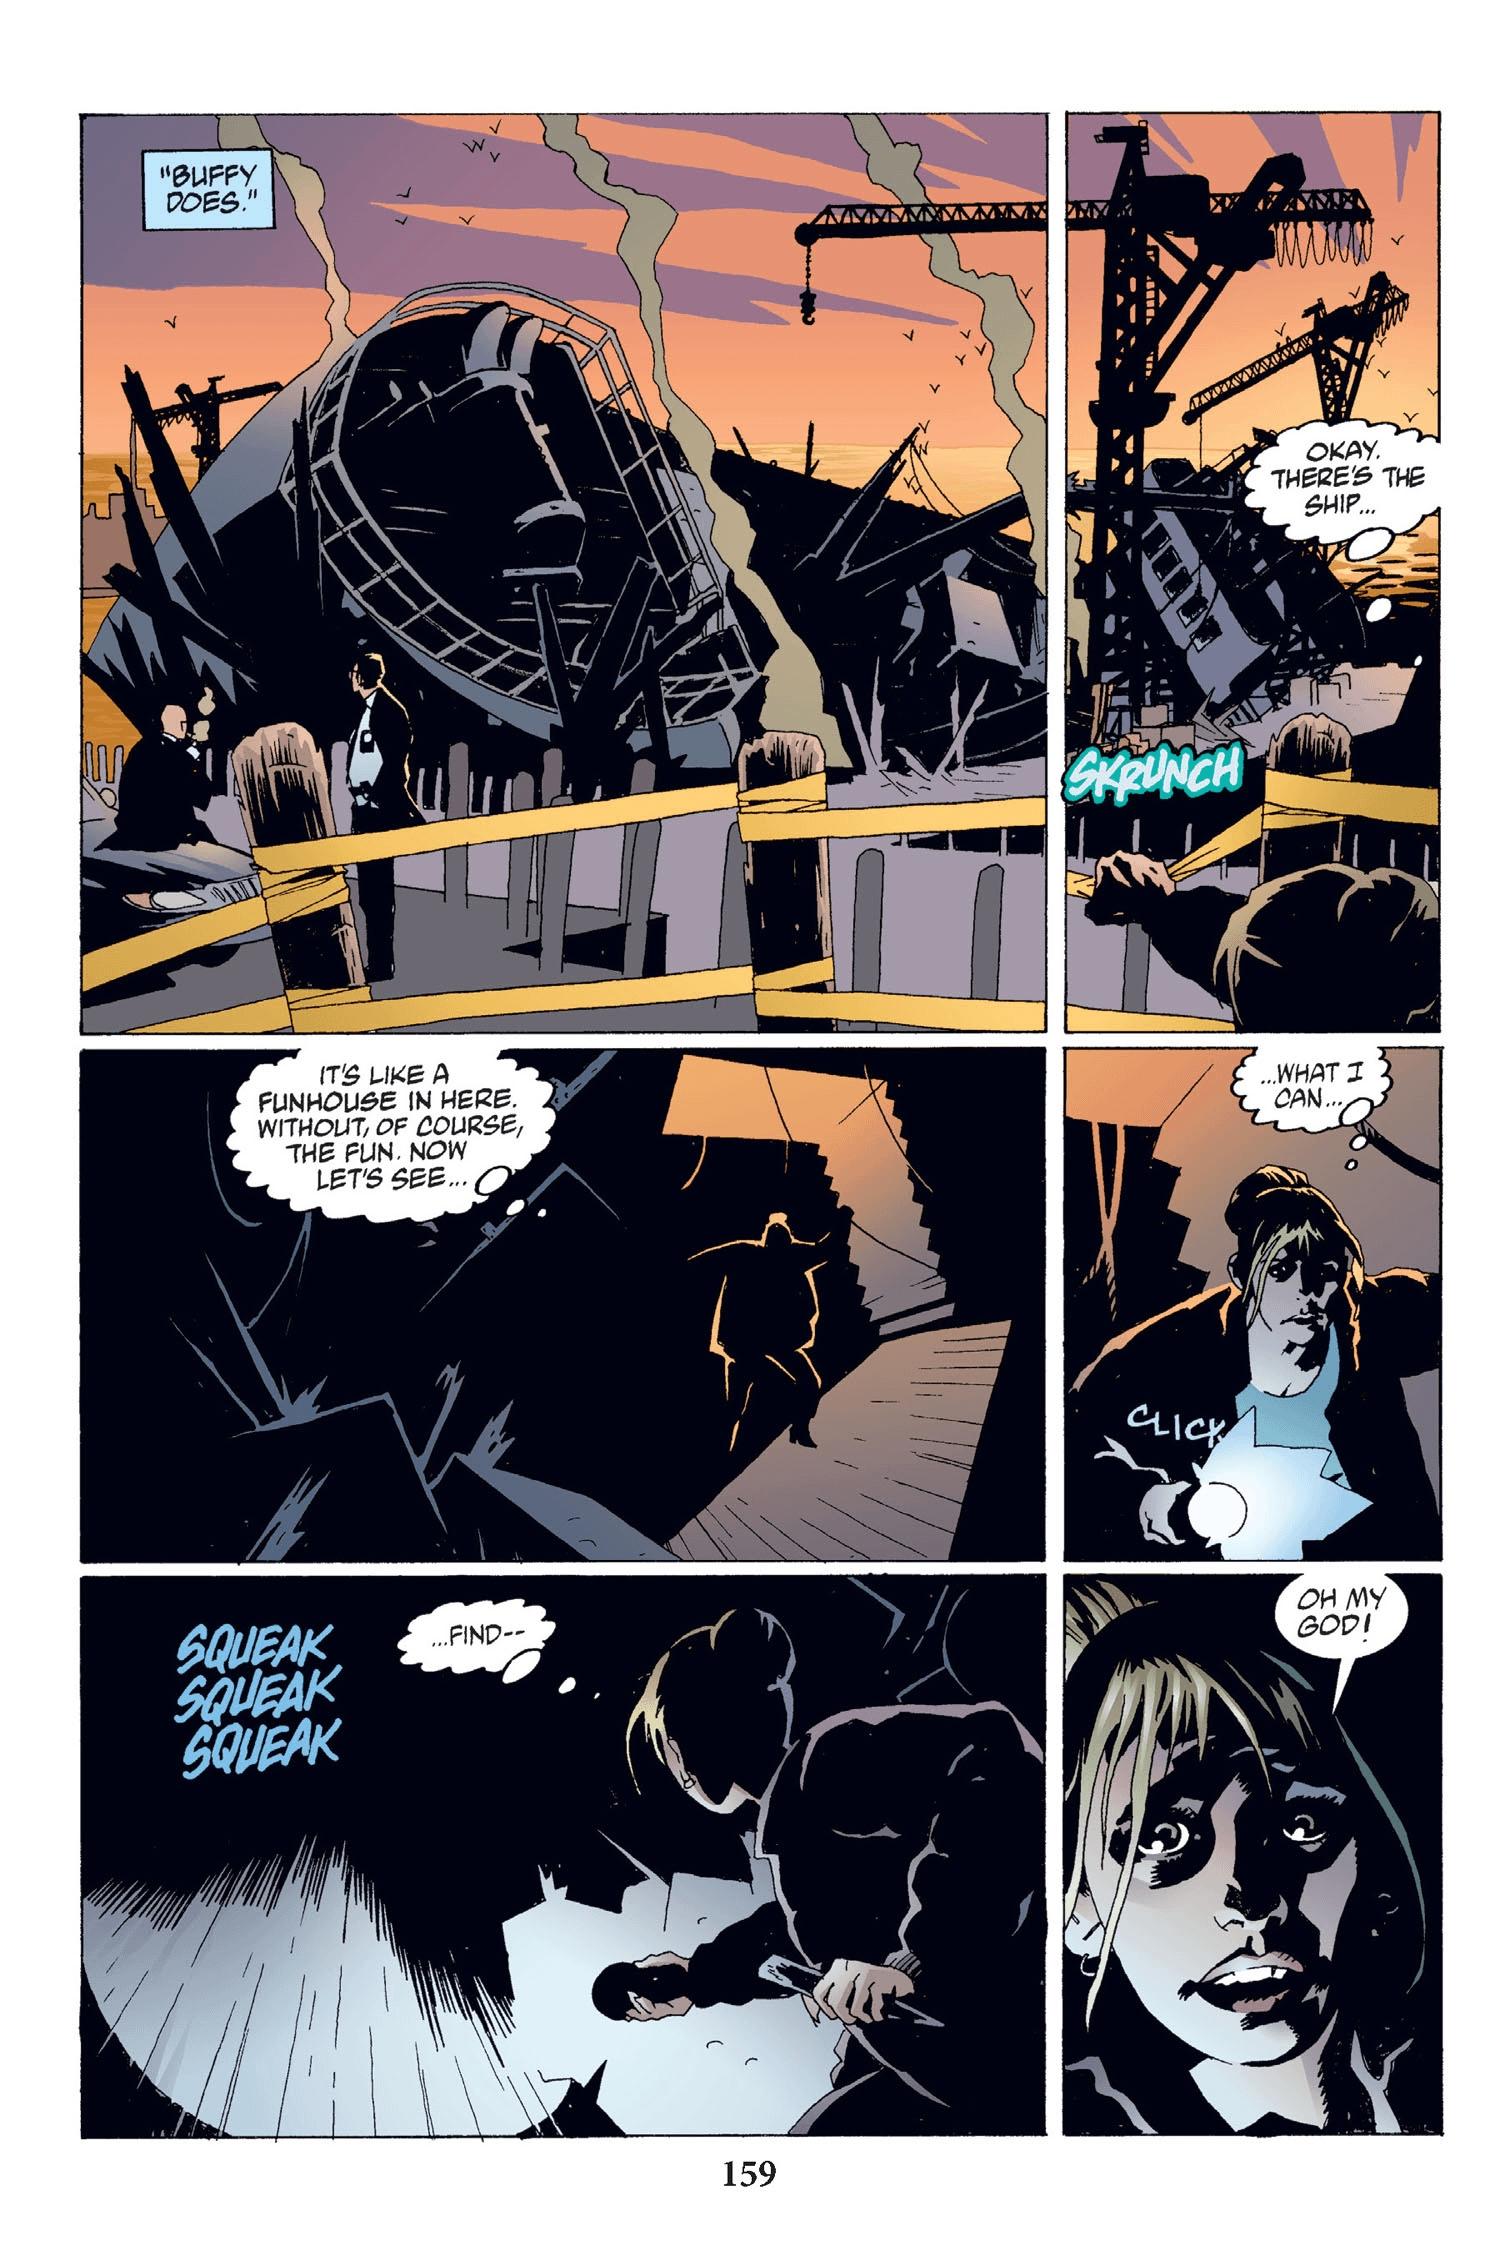 Read online Buffy the Vampire Slayer: Omnibus comic -  Issue # TPB 2 - 153